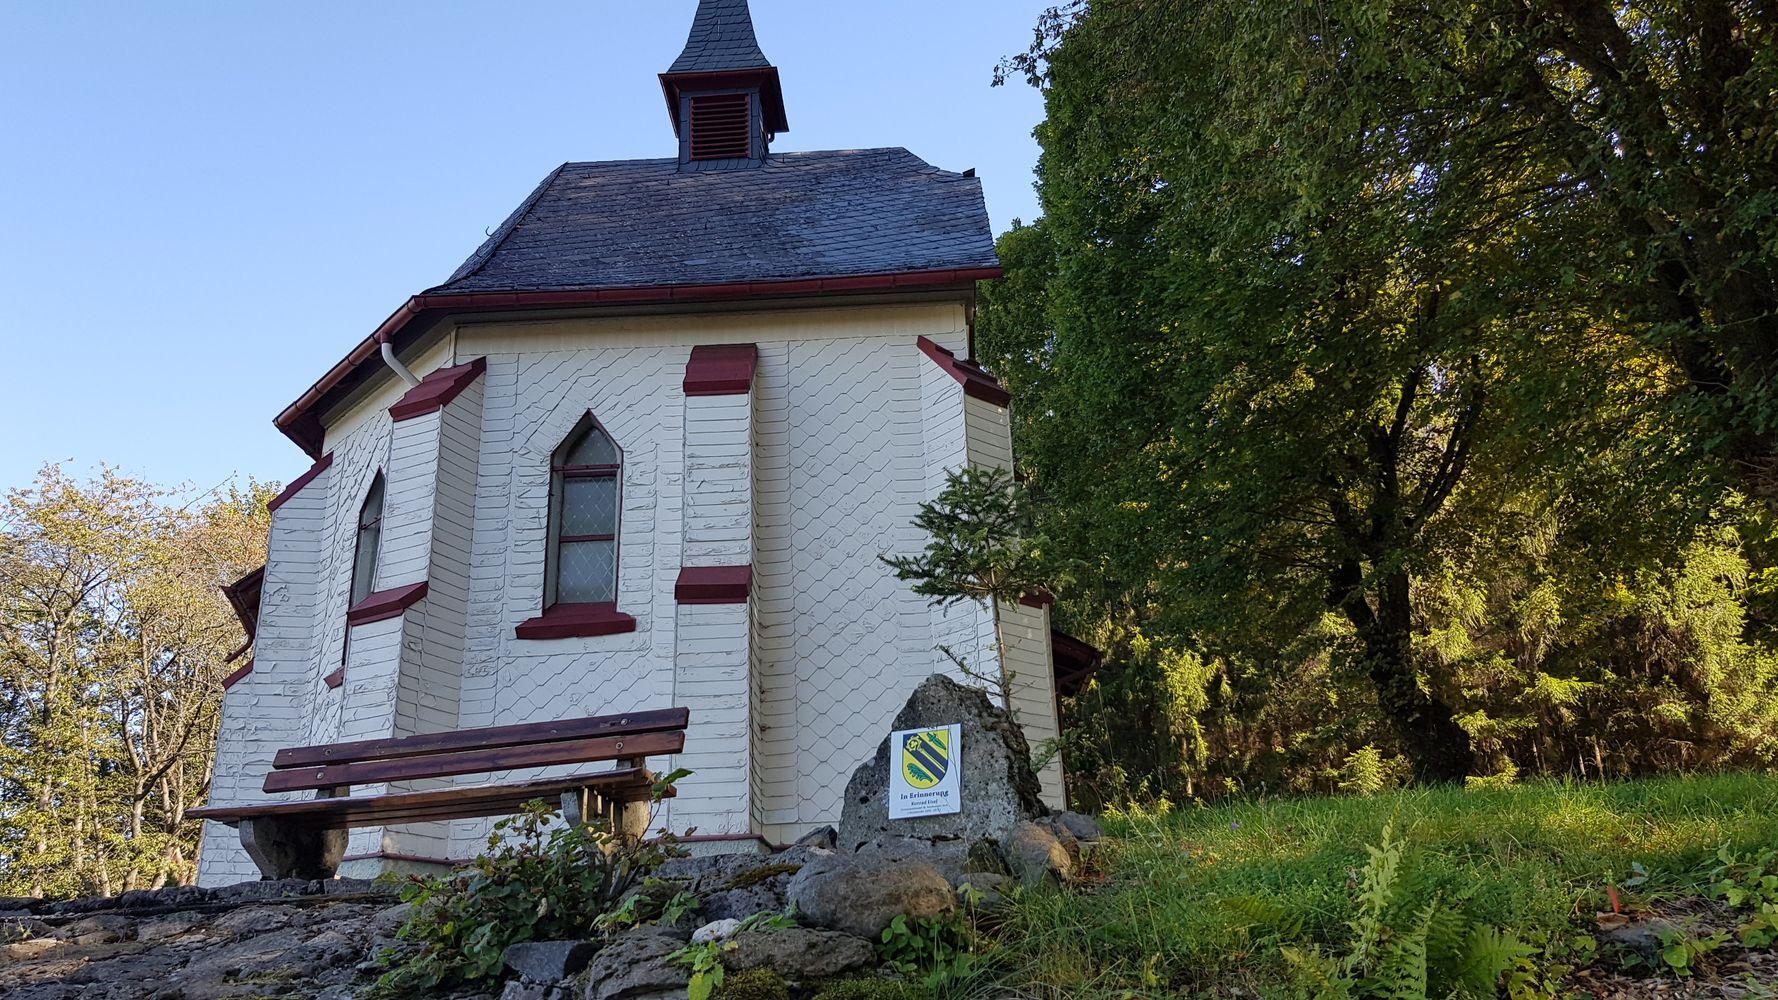 Die Geschichte der St. Michael-Josefs-Kapelle ist eng verknüpft mit dem 1891 gegründeten Josefverein